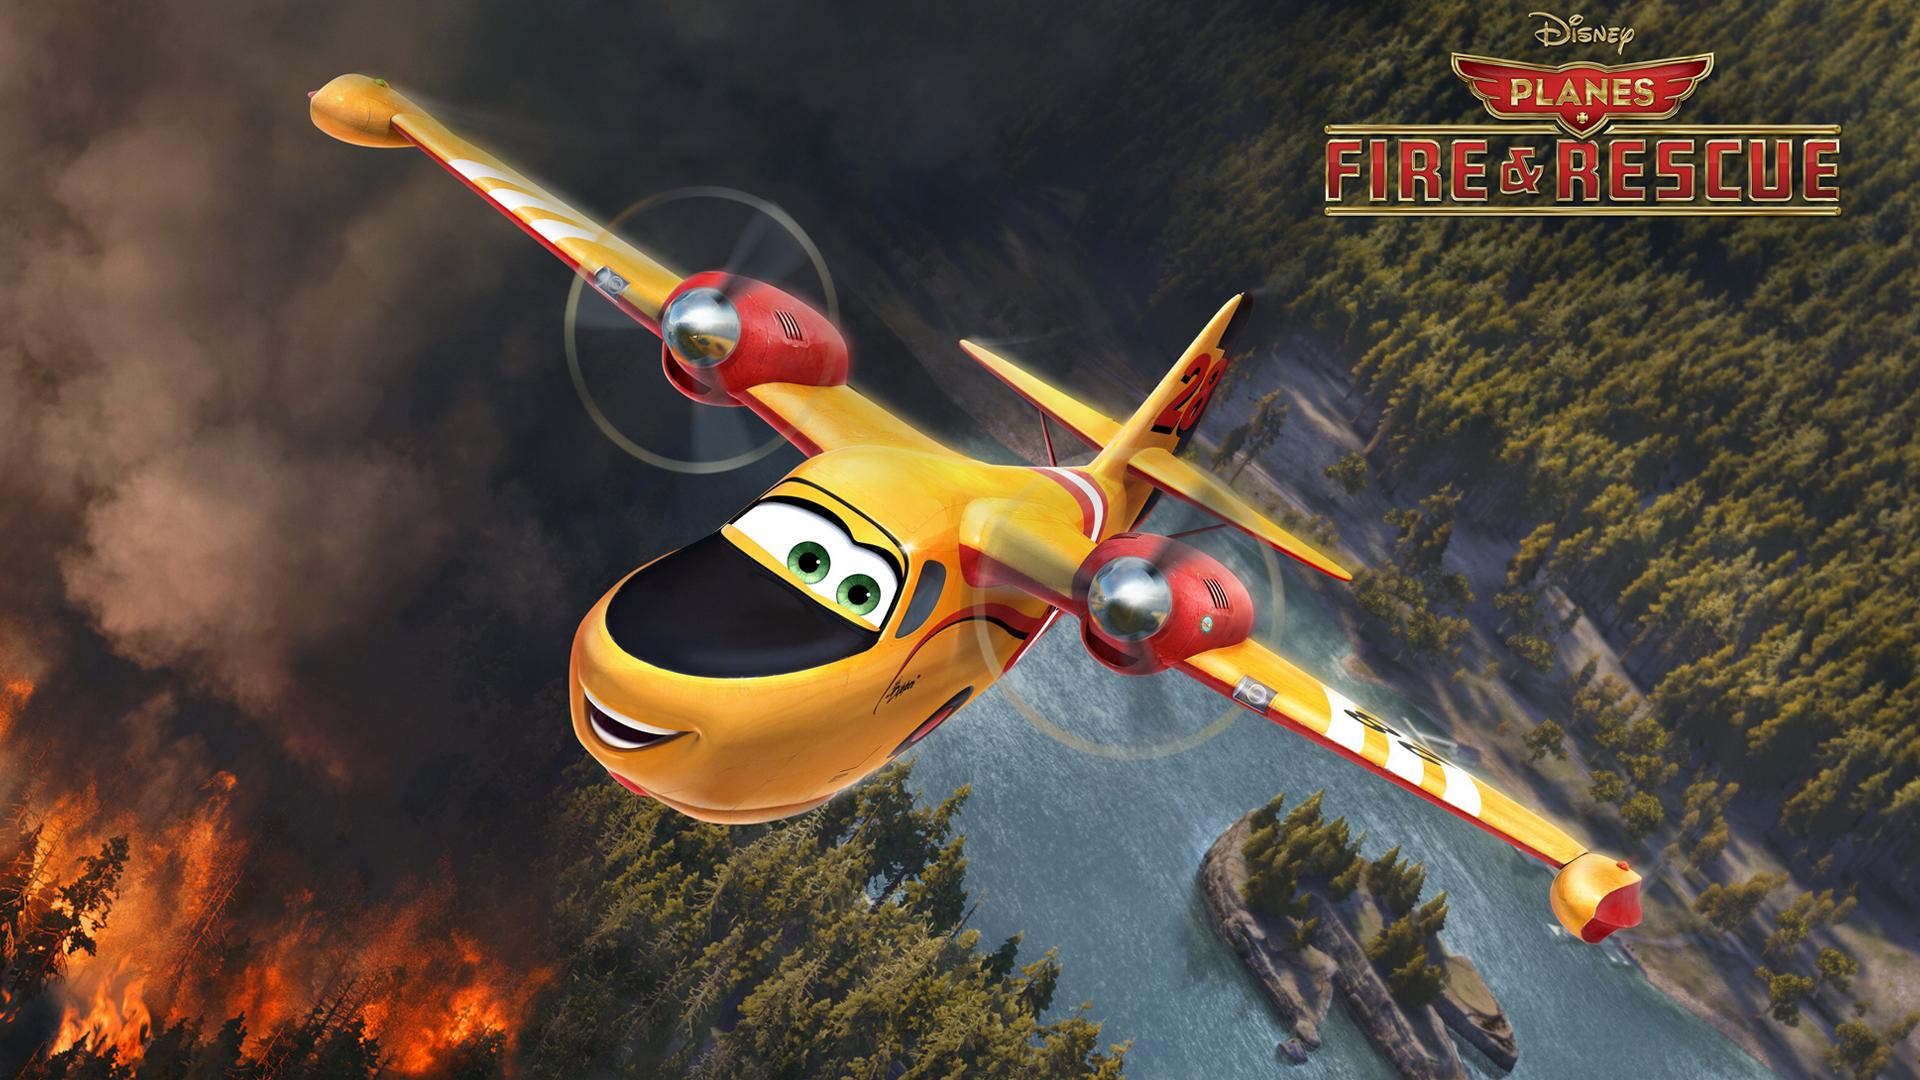 Lil Dipper Planes 2014 Wallpaper HD